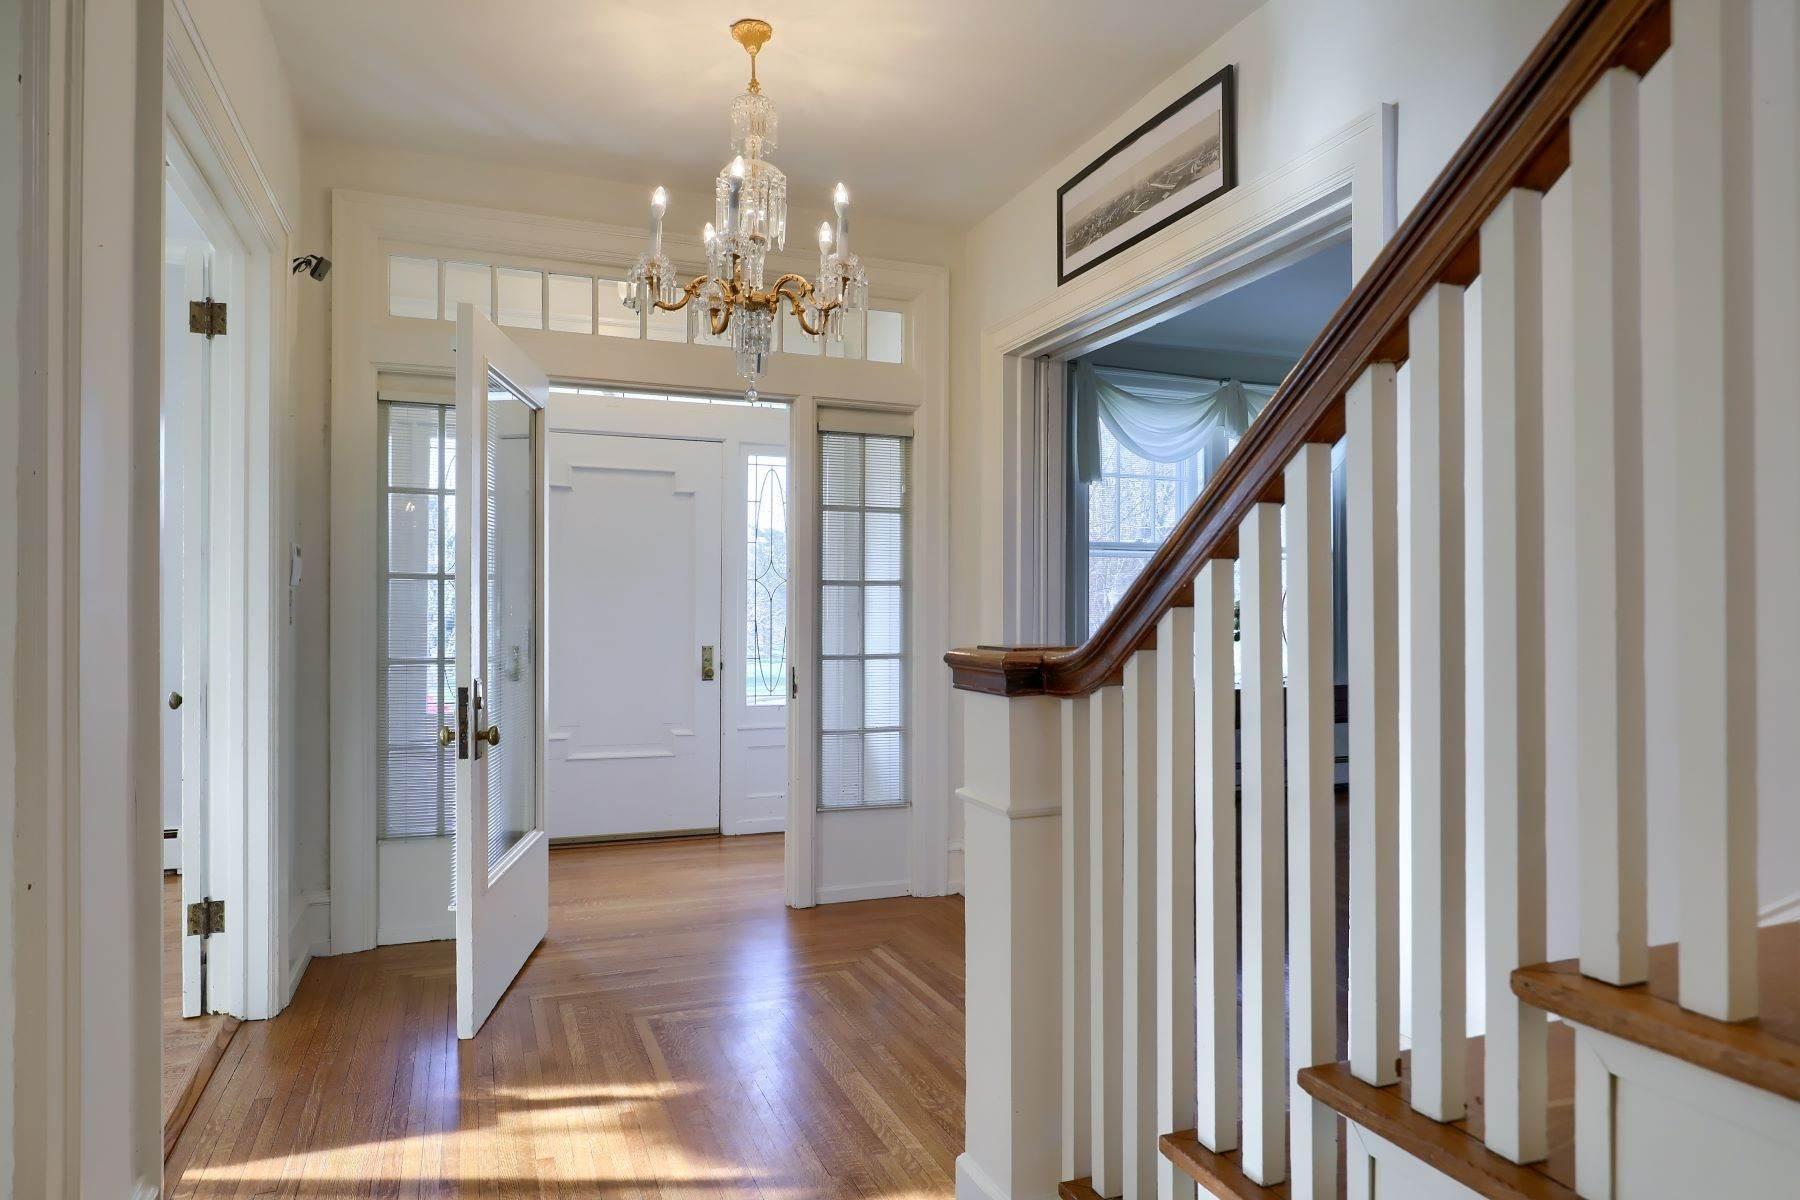 10. Single Family Homes for Sale at 206 E Granada Ave Hershey, Pennsylvania 17033 United States